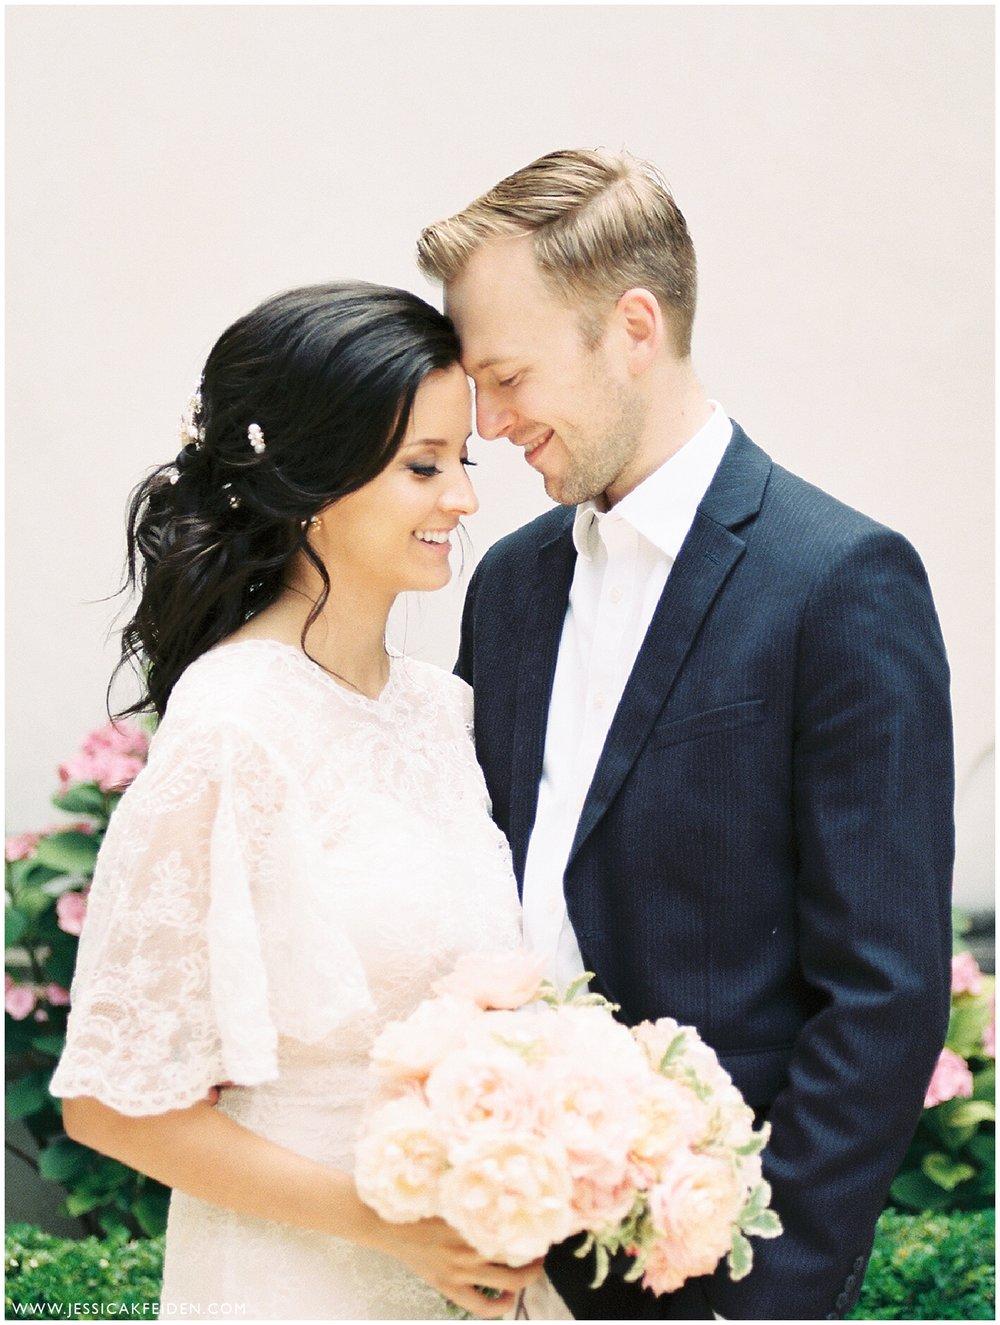 Jessica K Feiden Photography - Destination Paris Wedding_Film Photography_0008.jpg